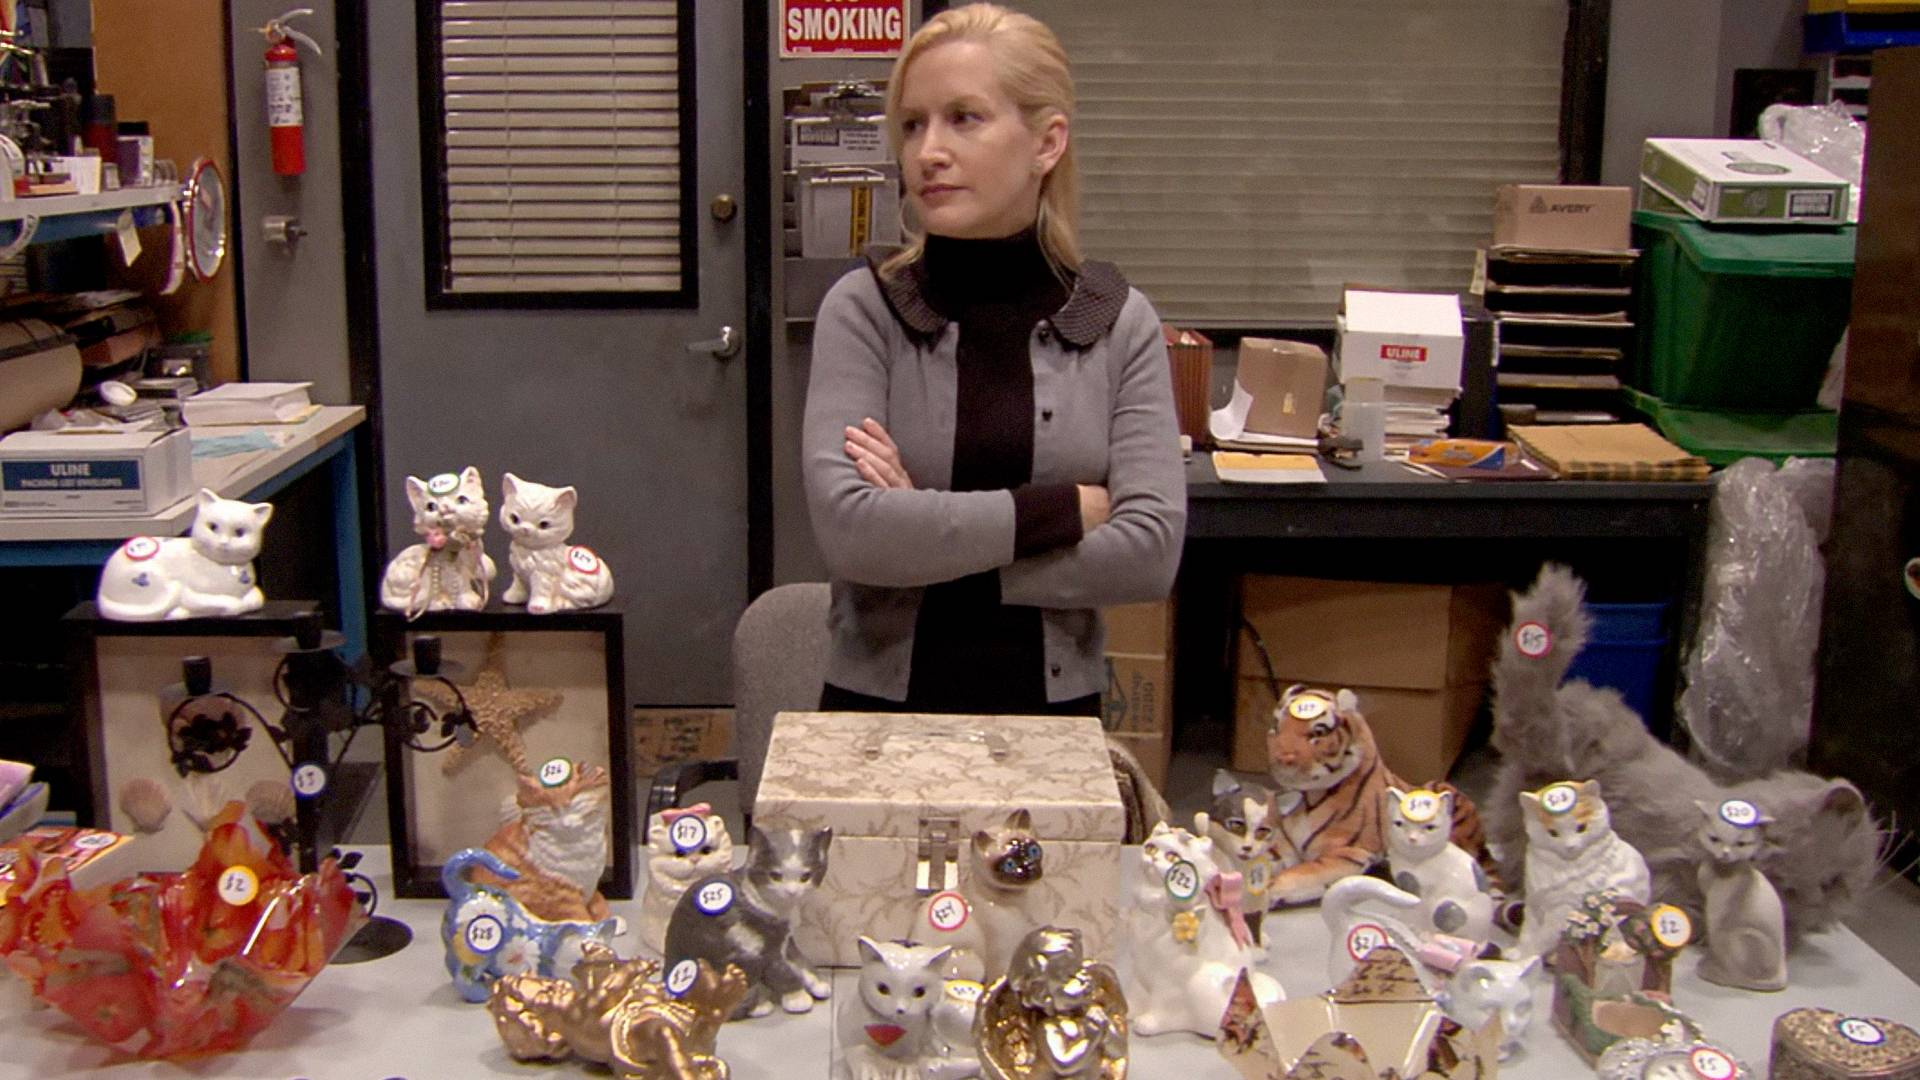 The Office Season 7 Episode 19